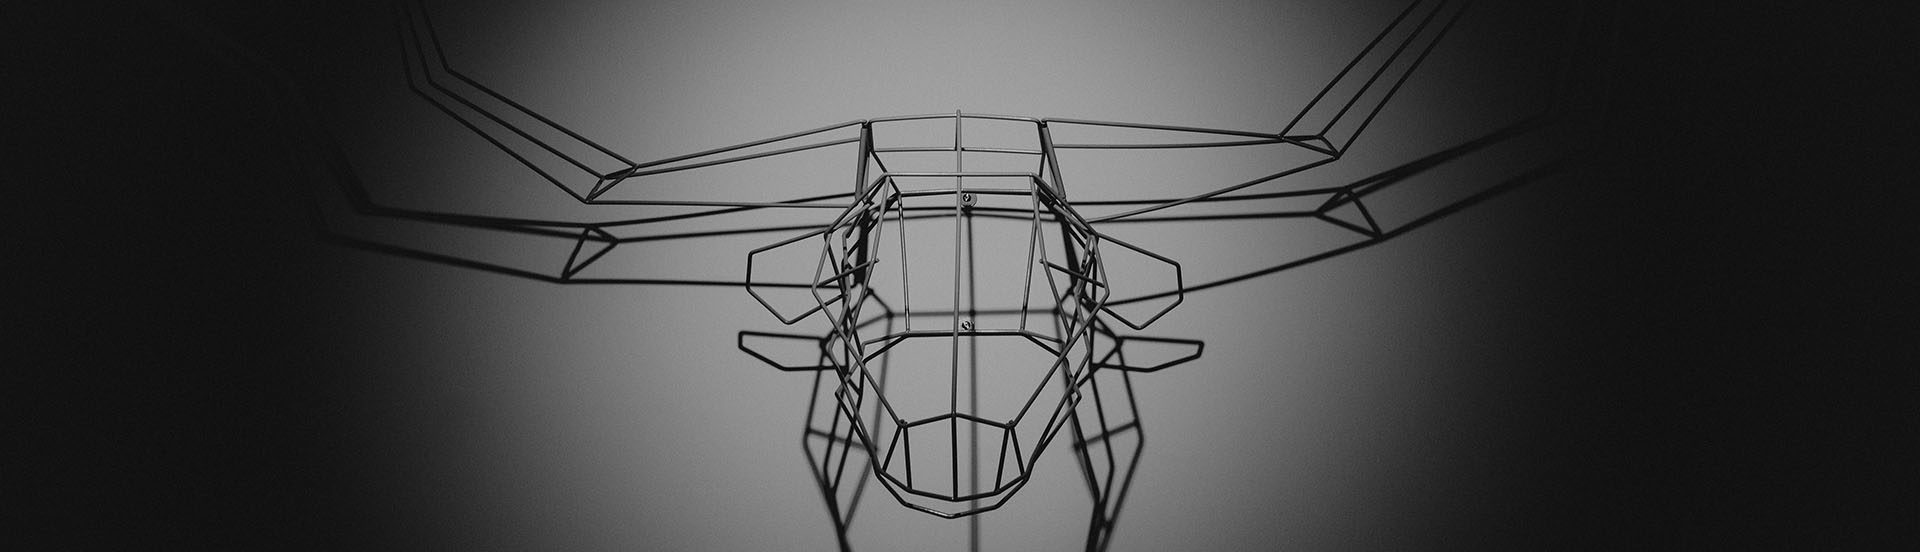 Sketch Wireframe Mockup Prototype